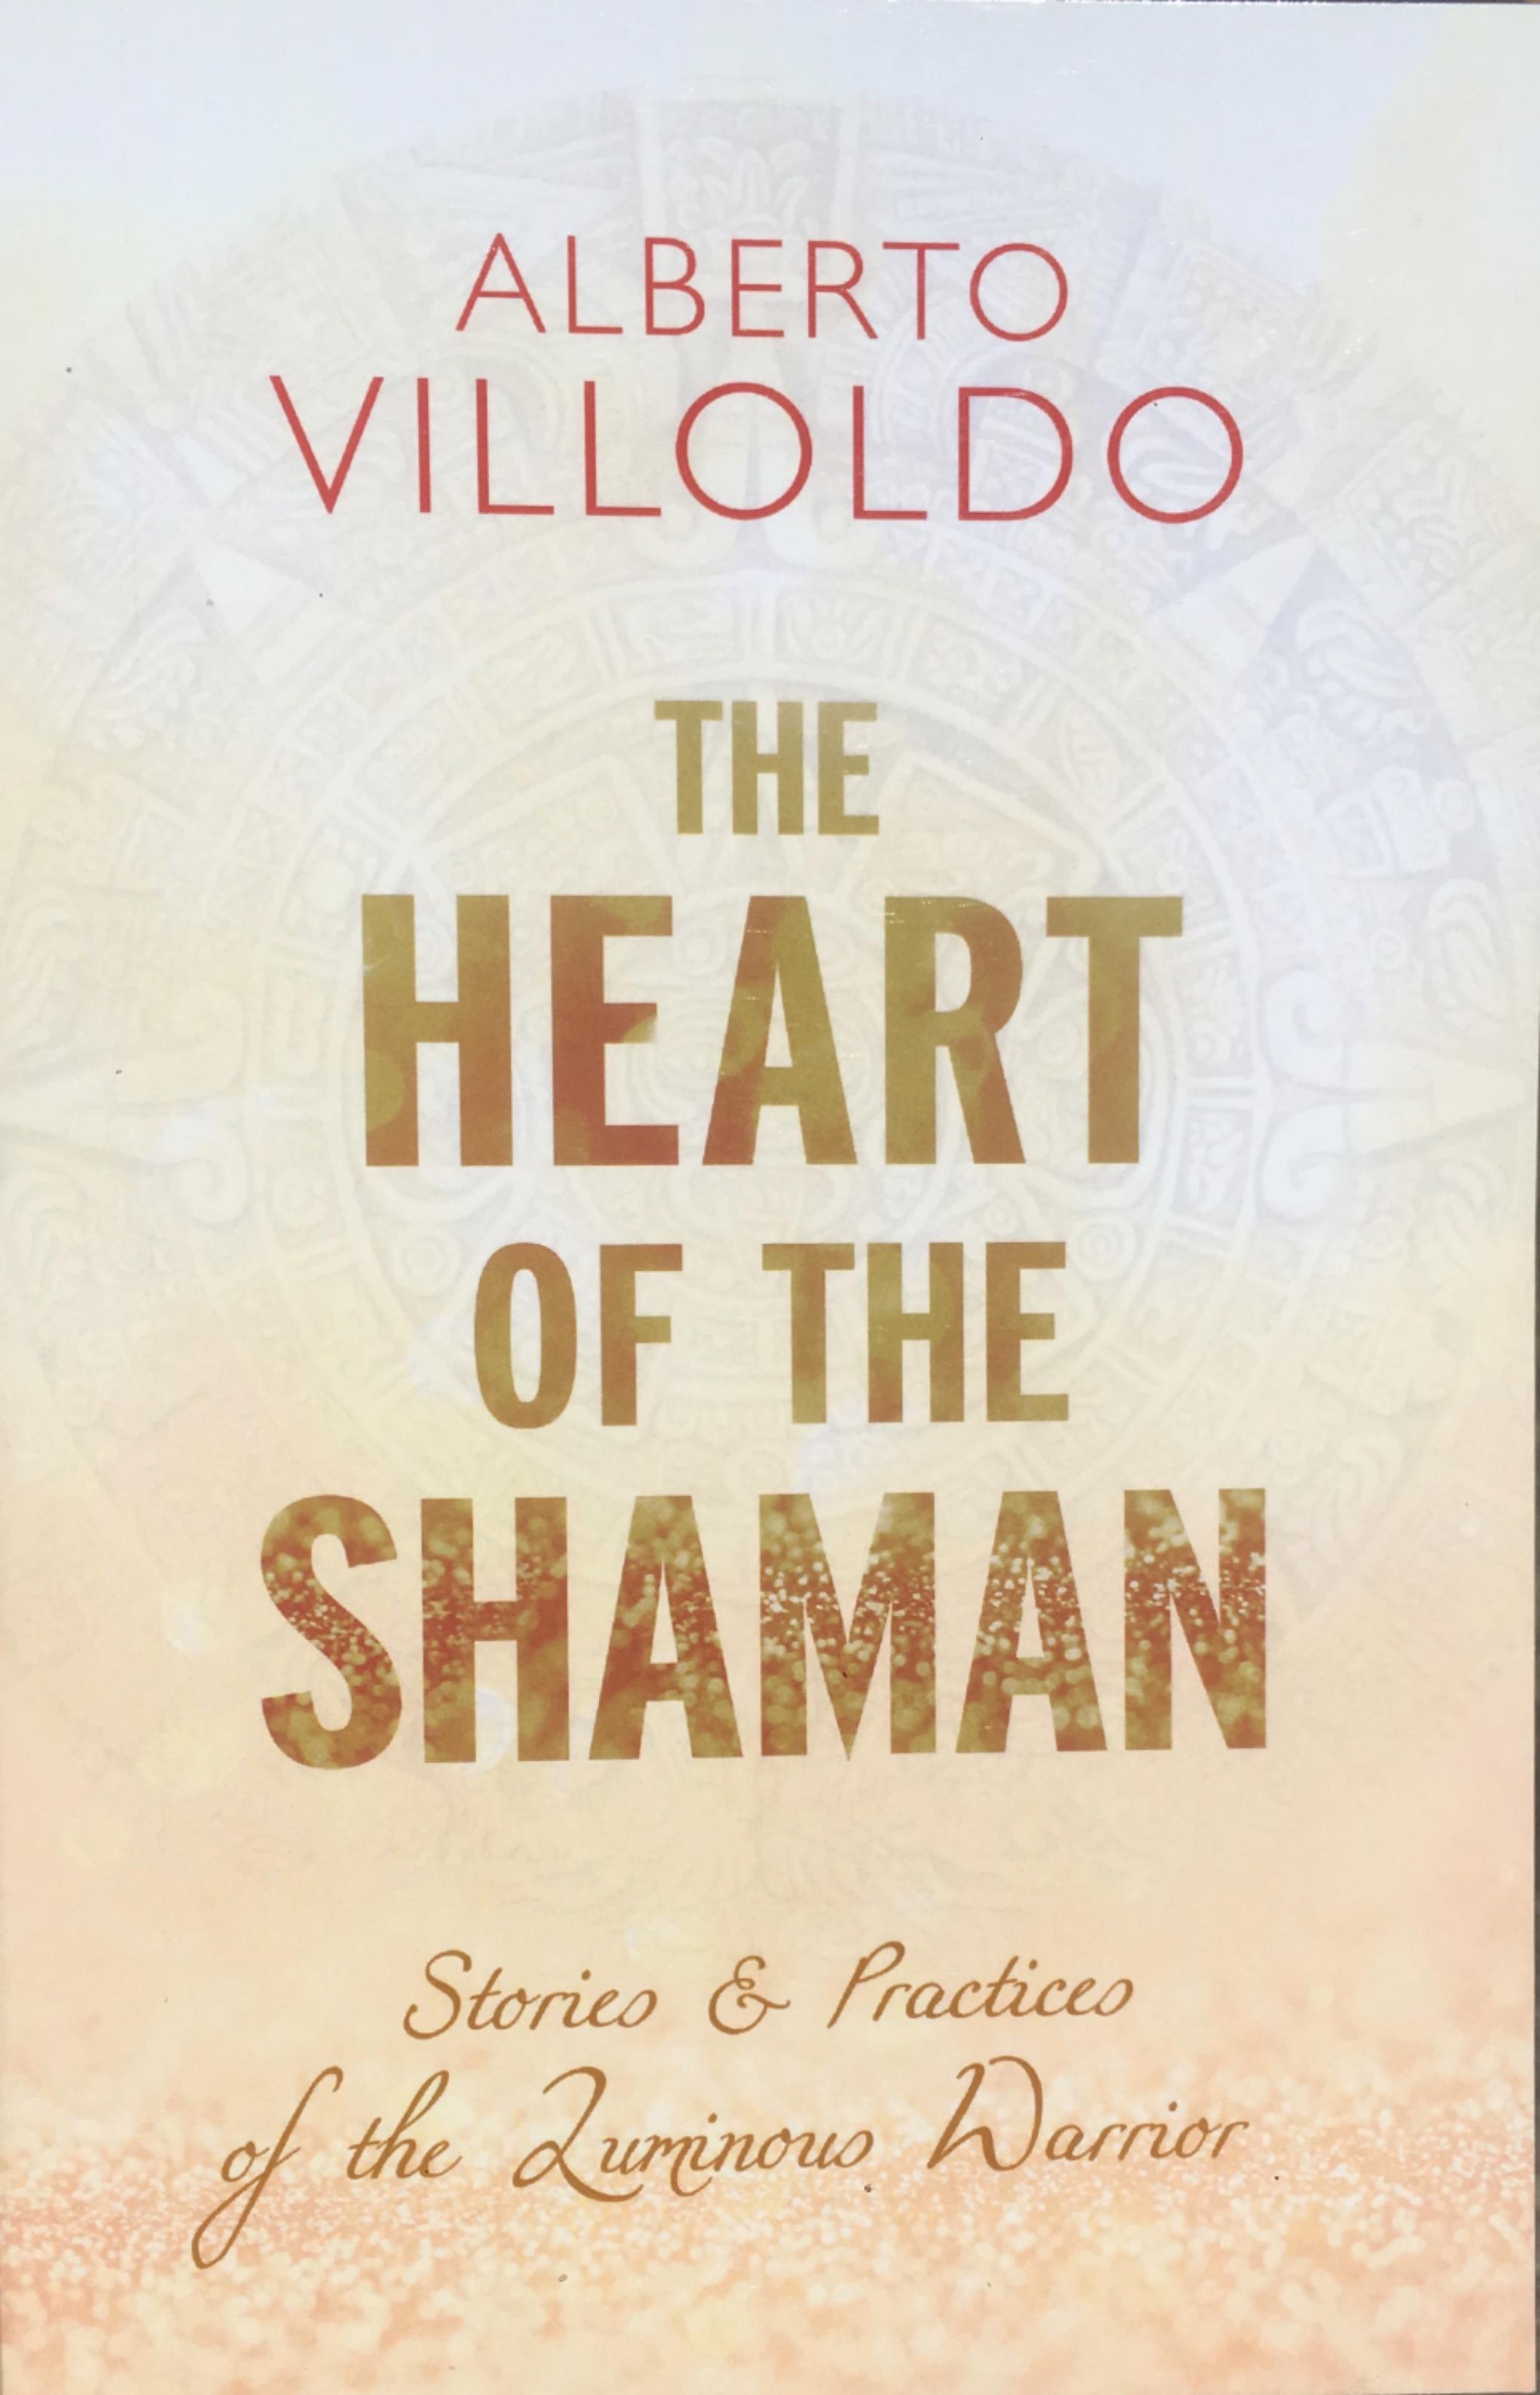 The heart of the shaman BOOKS.jpg